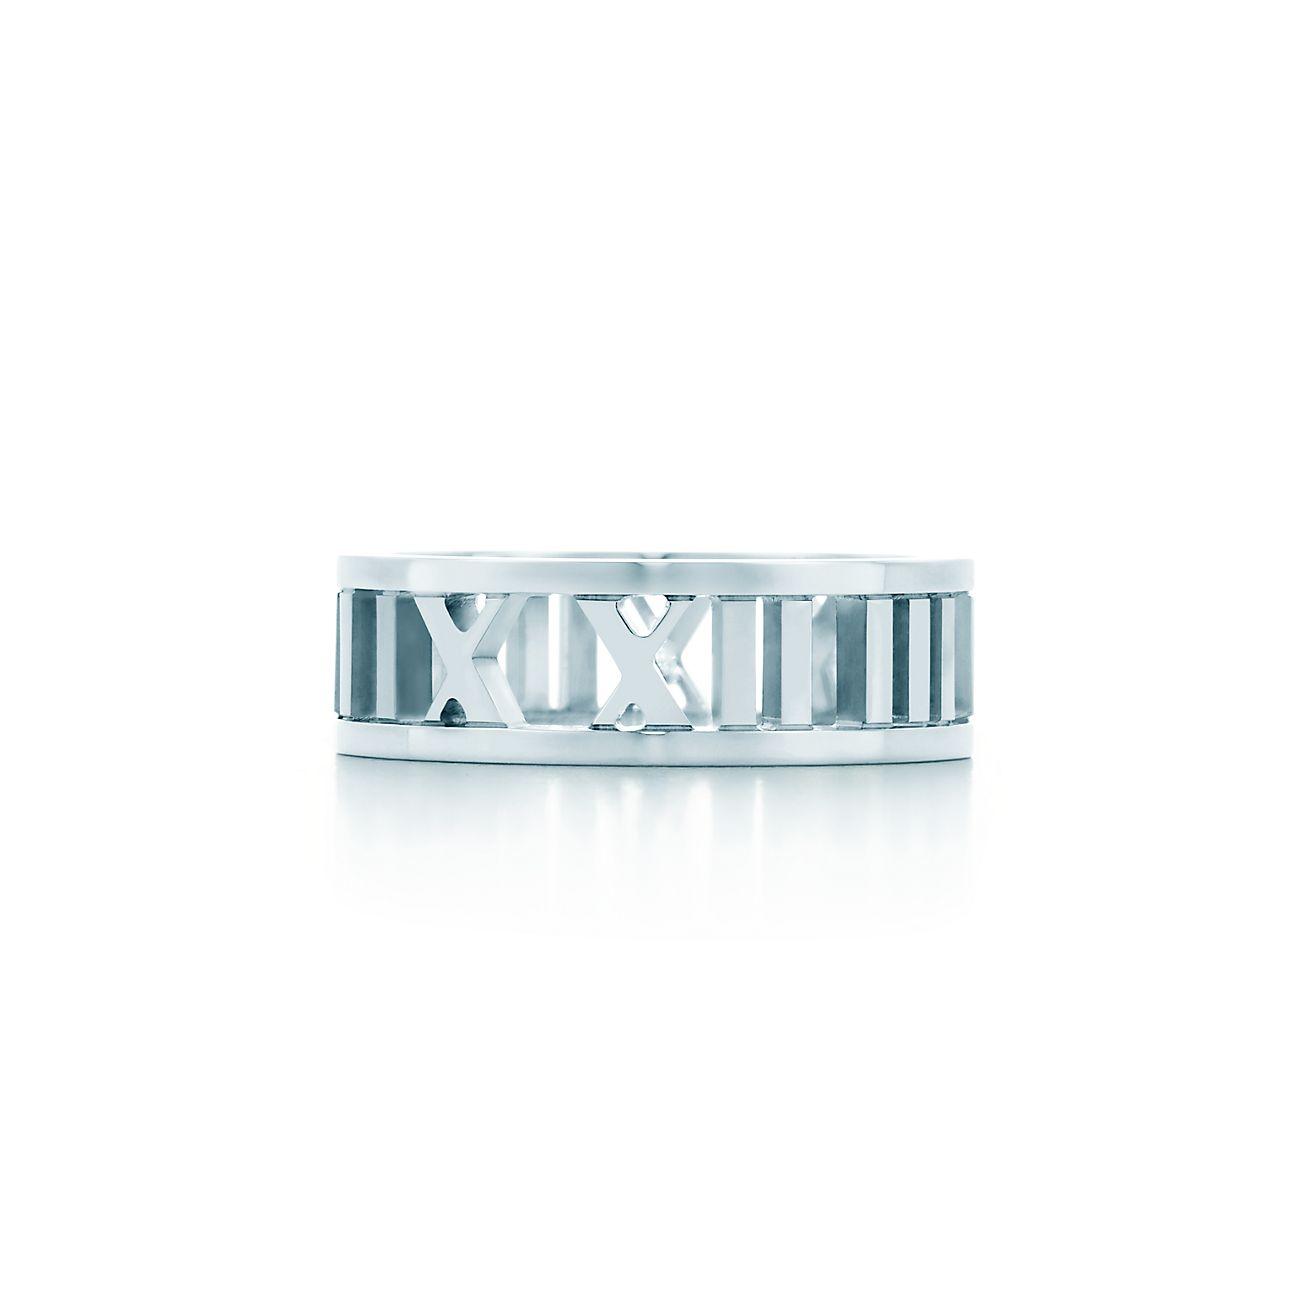 Tifany Weding Rings 014 - Tifany Weding Rings